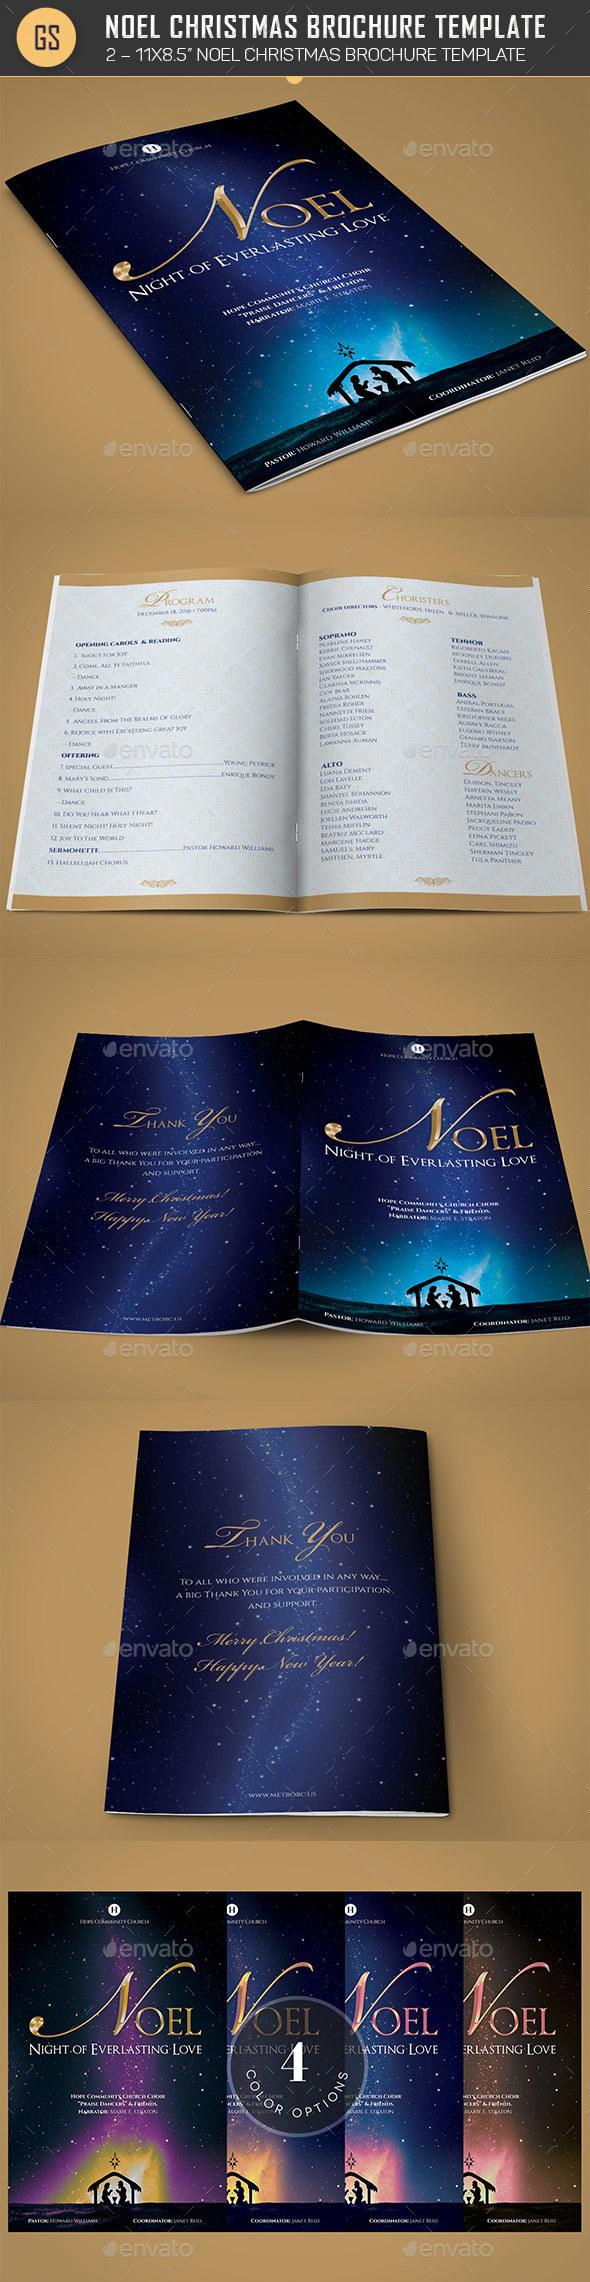 Noel Christmas Brochure Template by Godserv2 | GraphicRiver